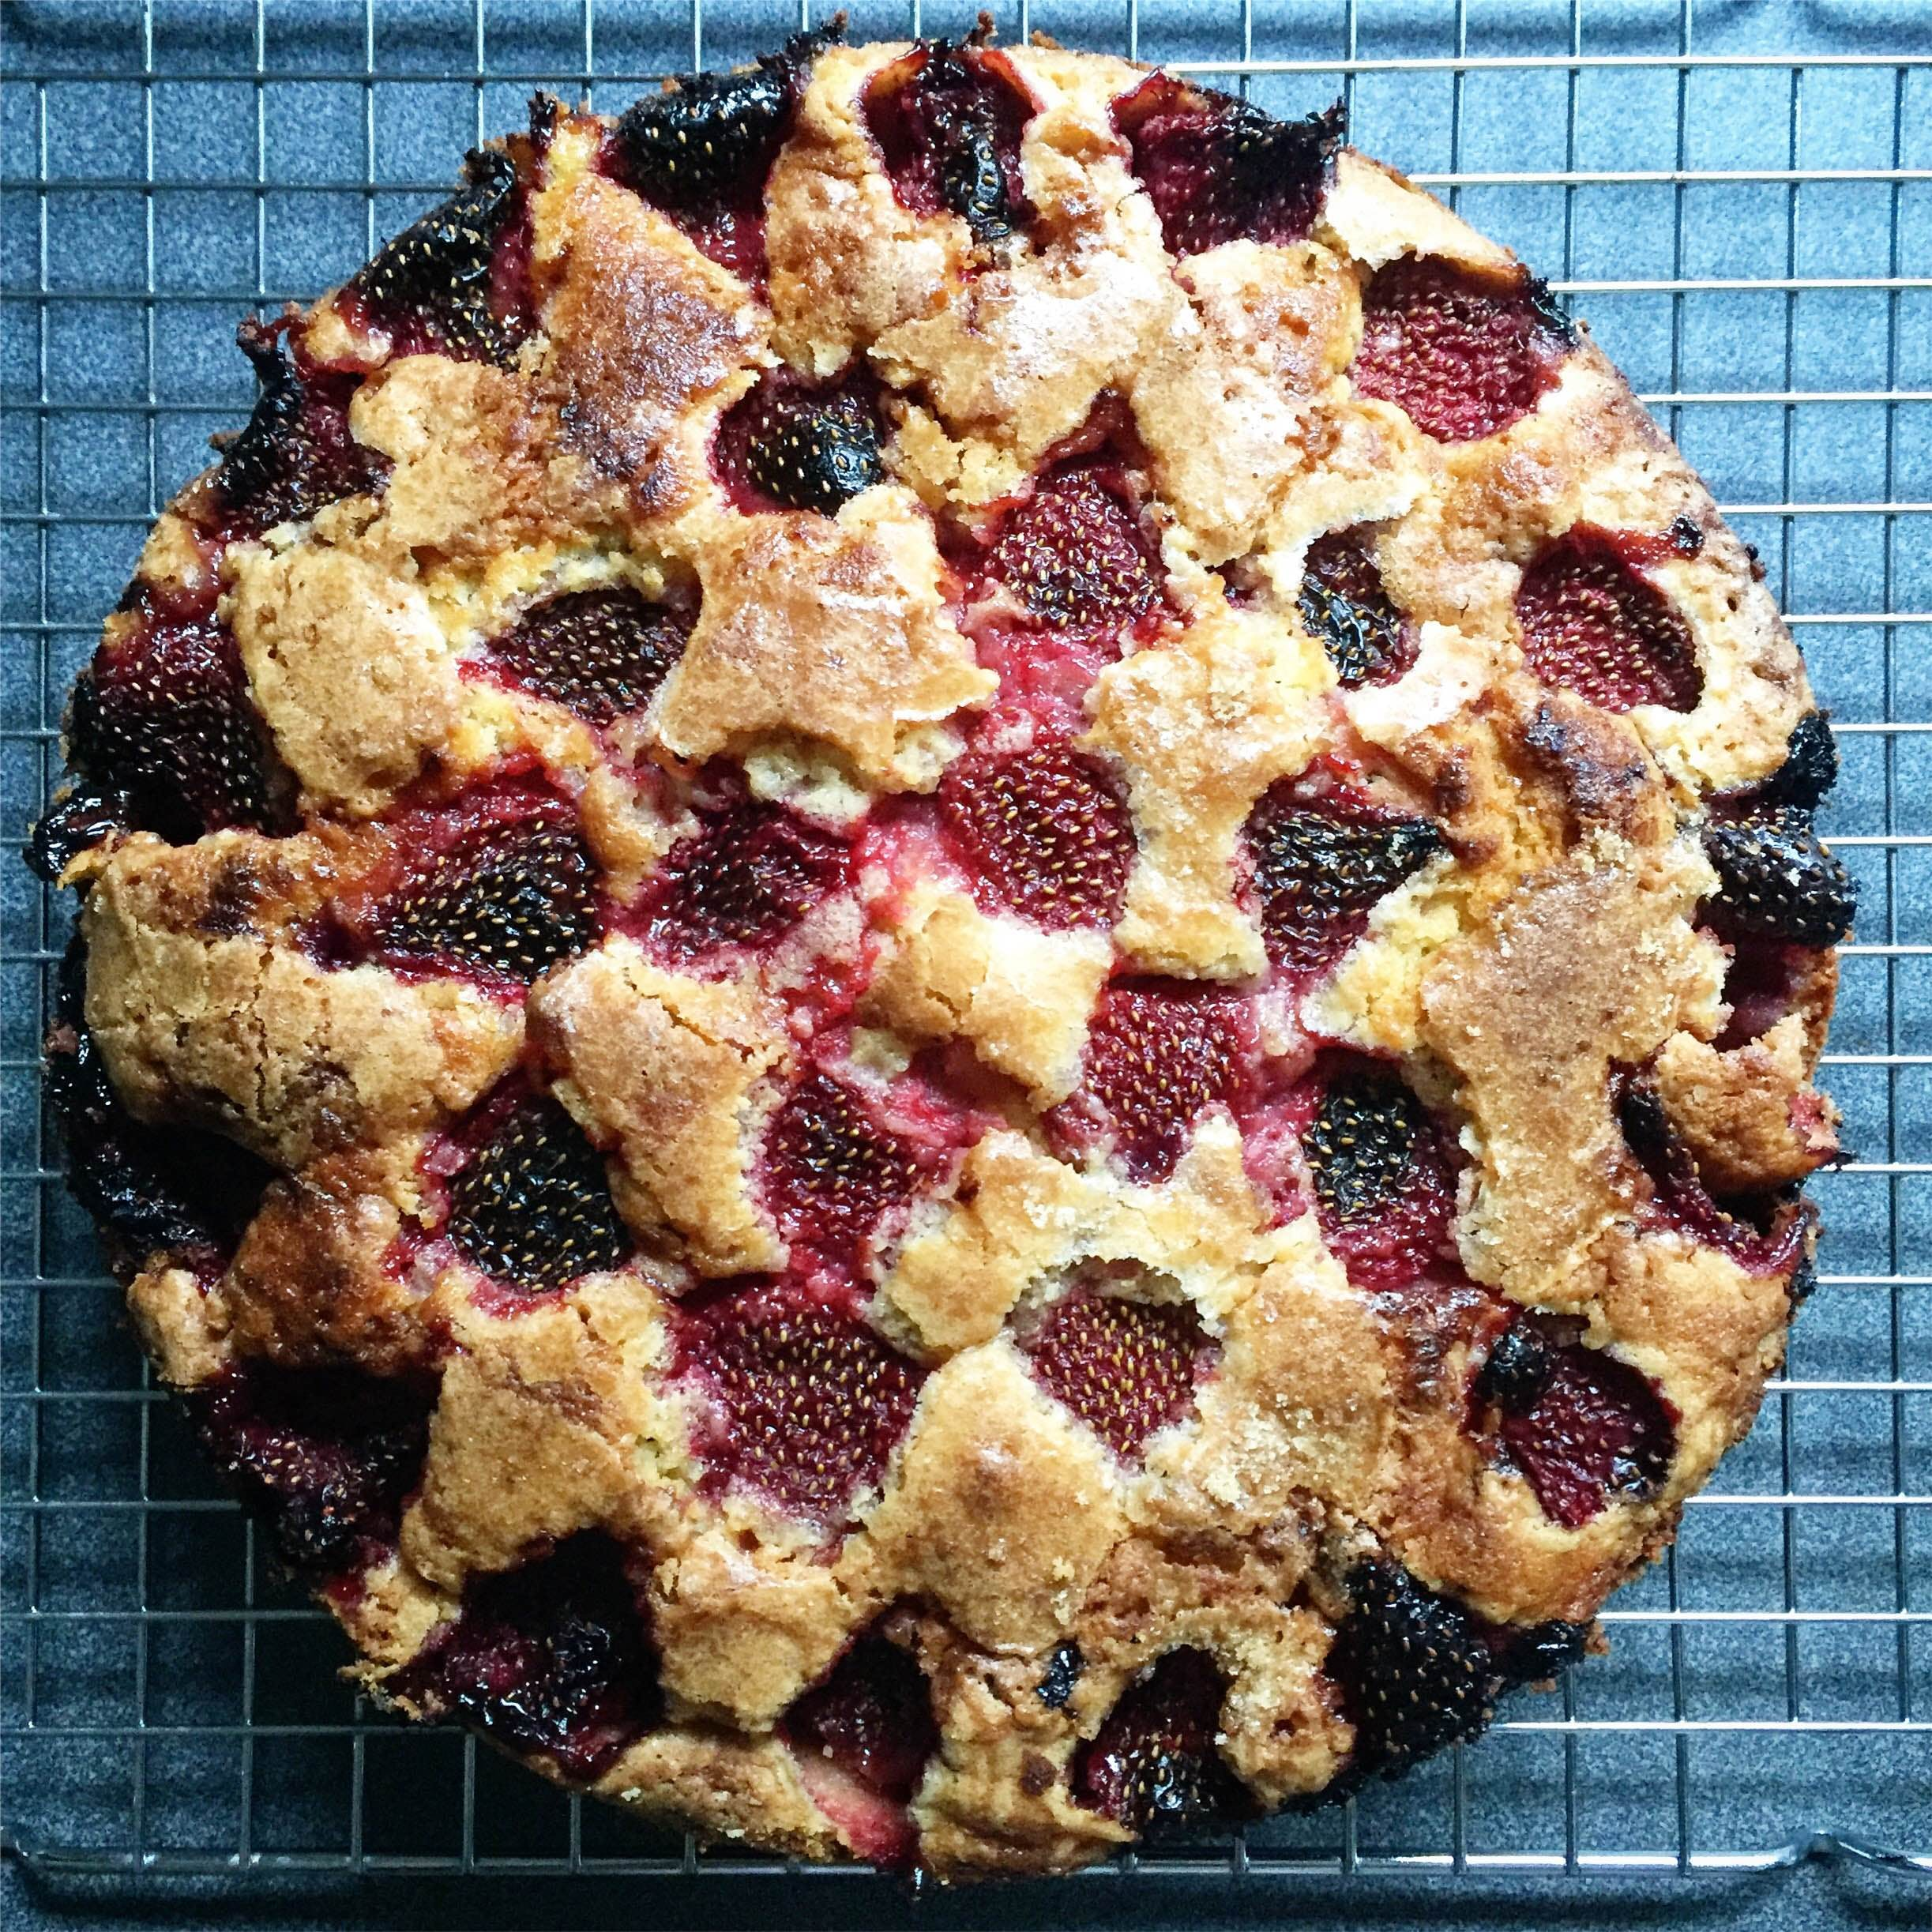 Strawberry & Blueberry Sponge Cake